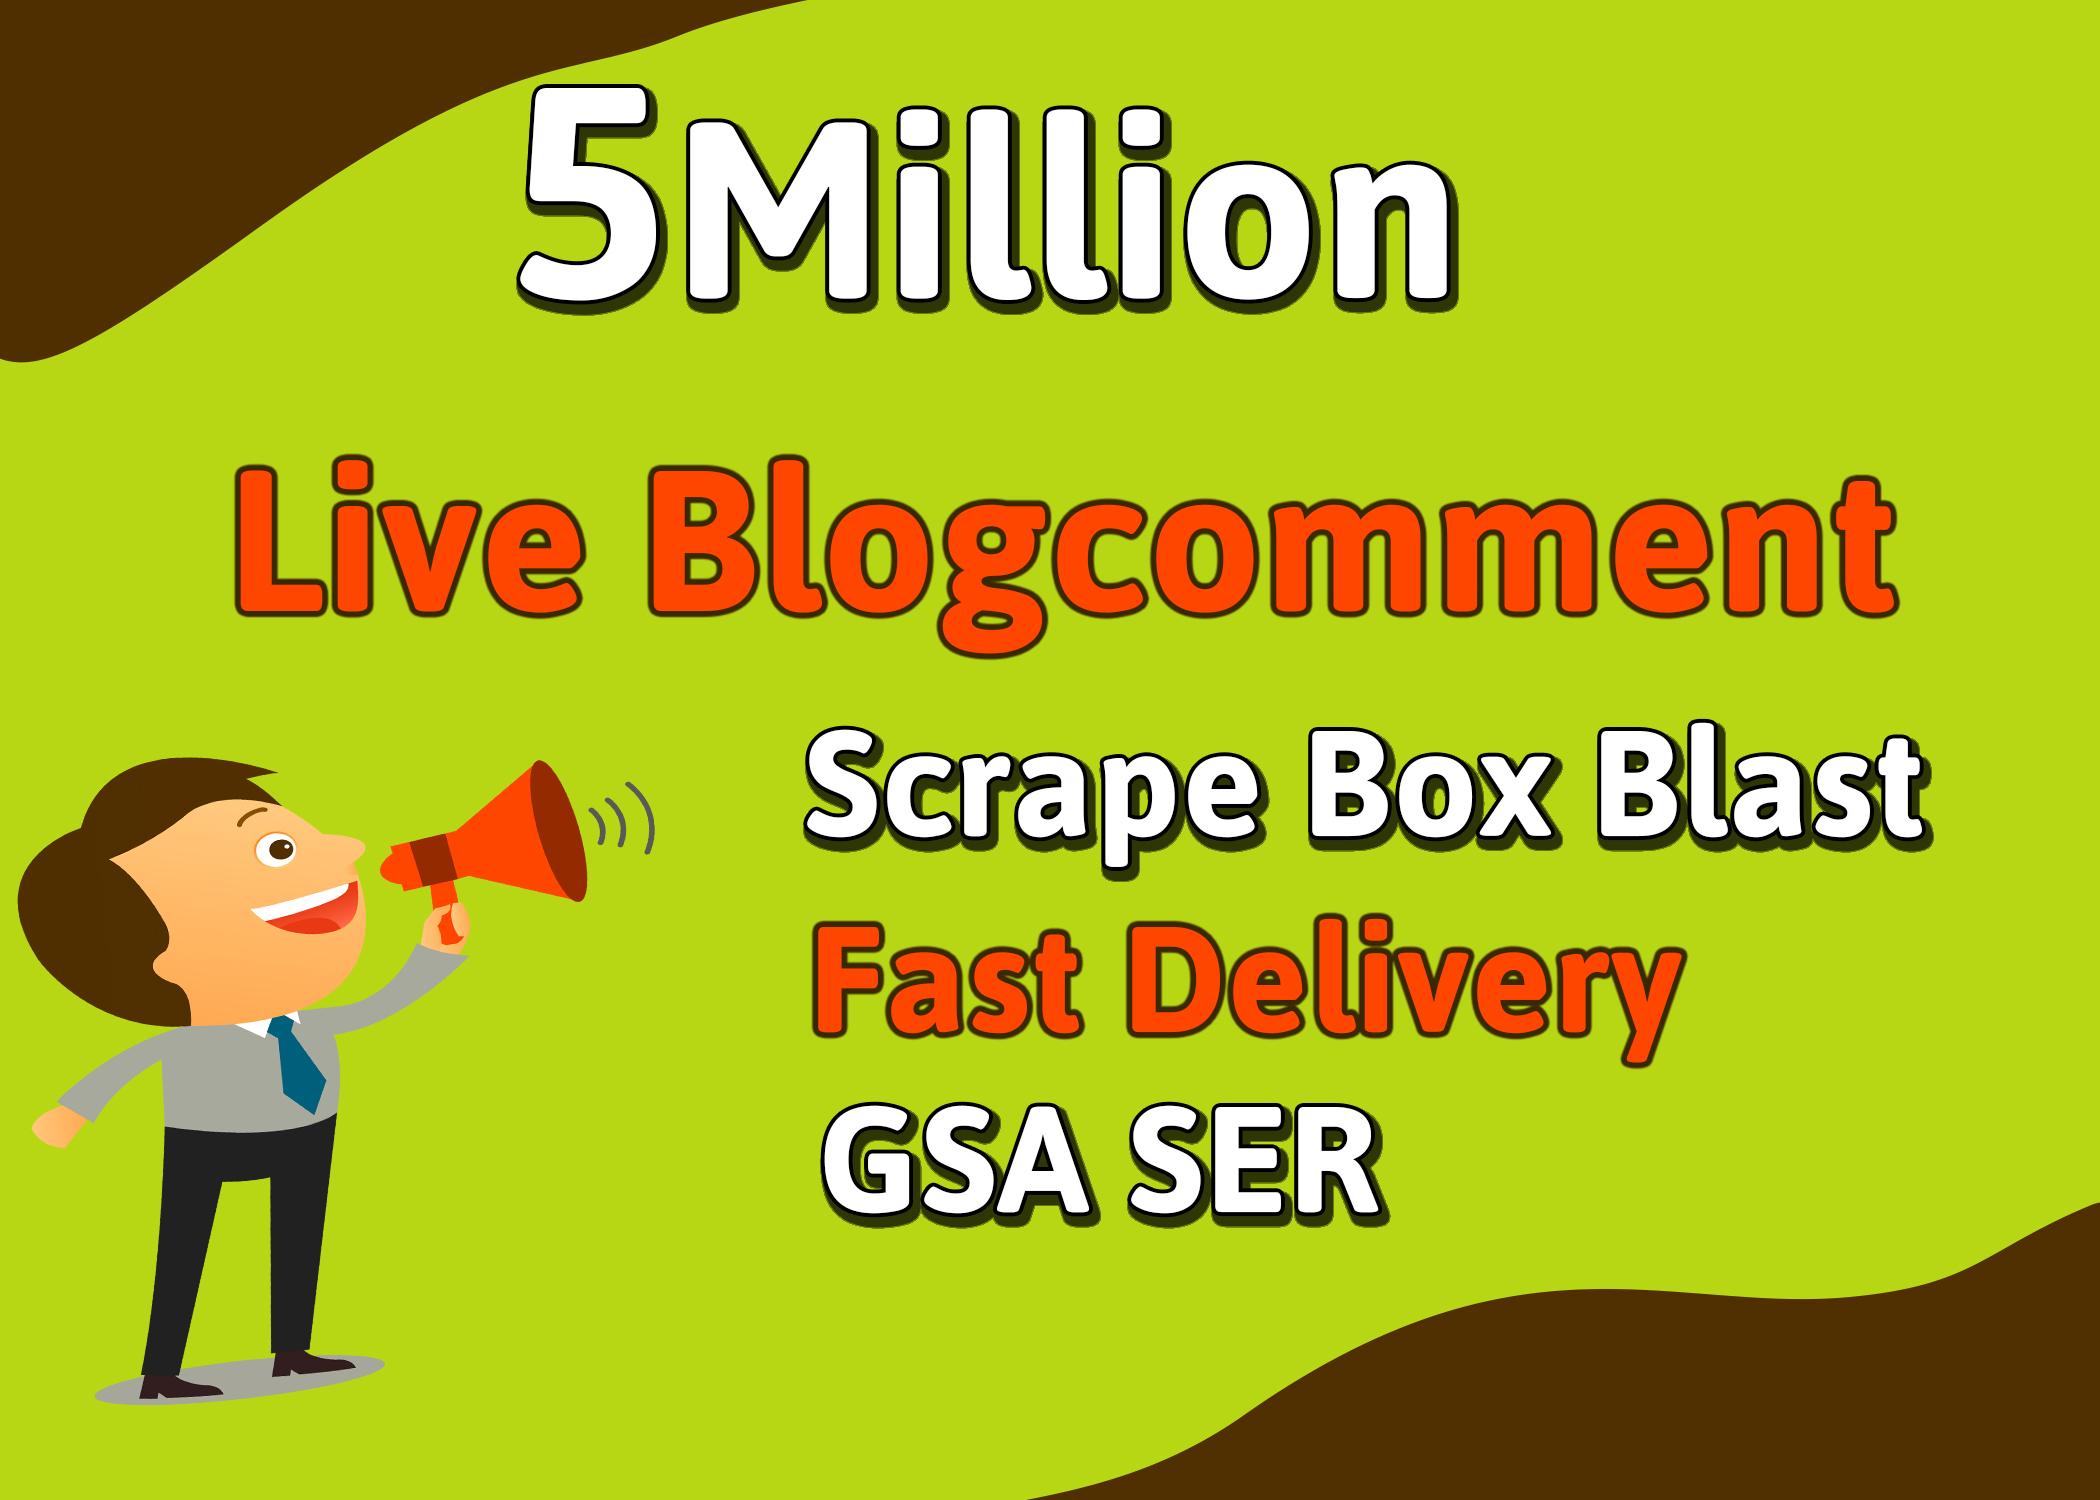 Create blast scrapebox 500,000 SEO blog comment backlinks